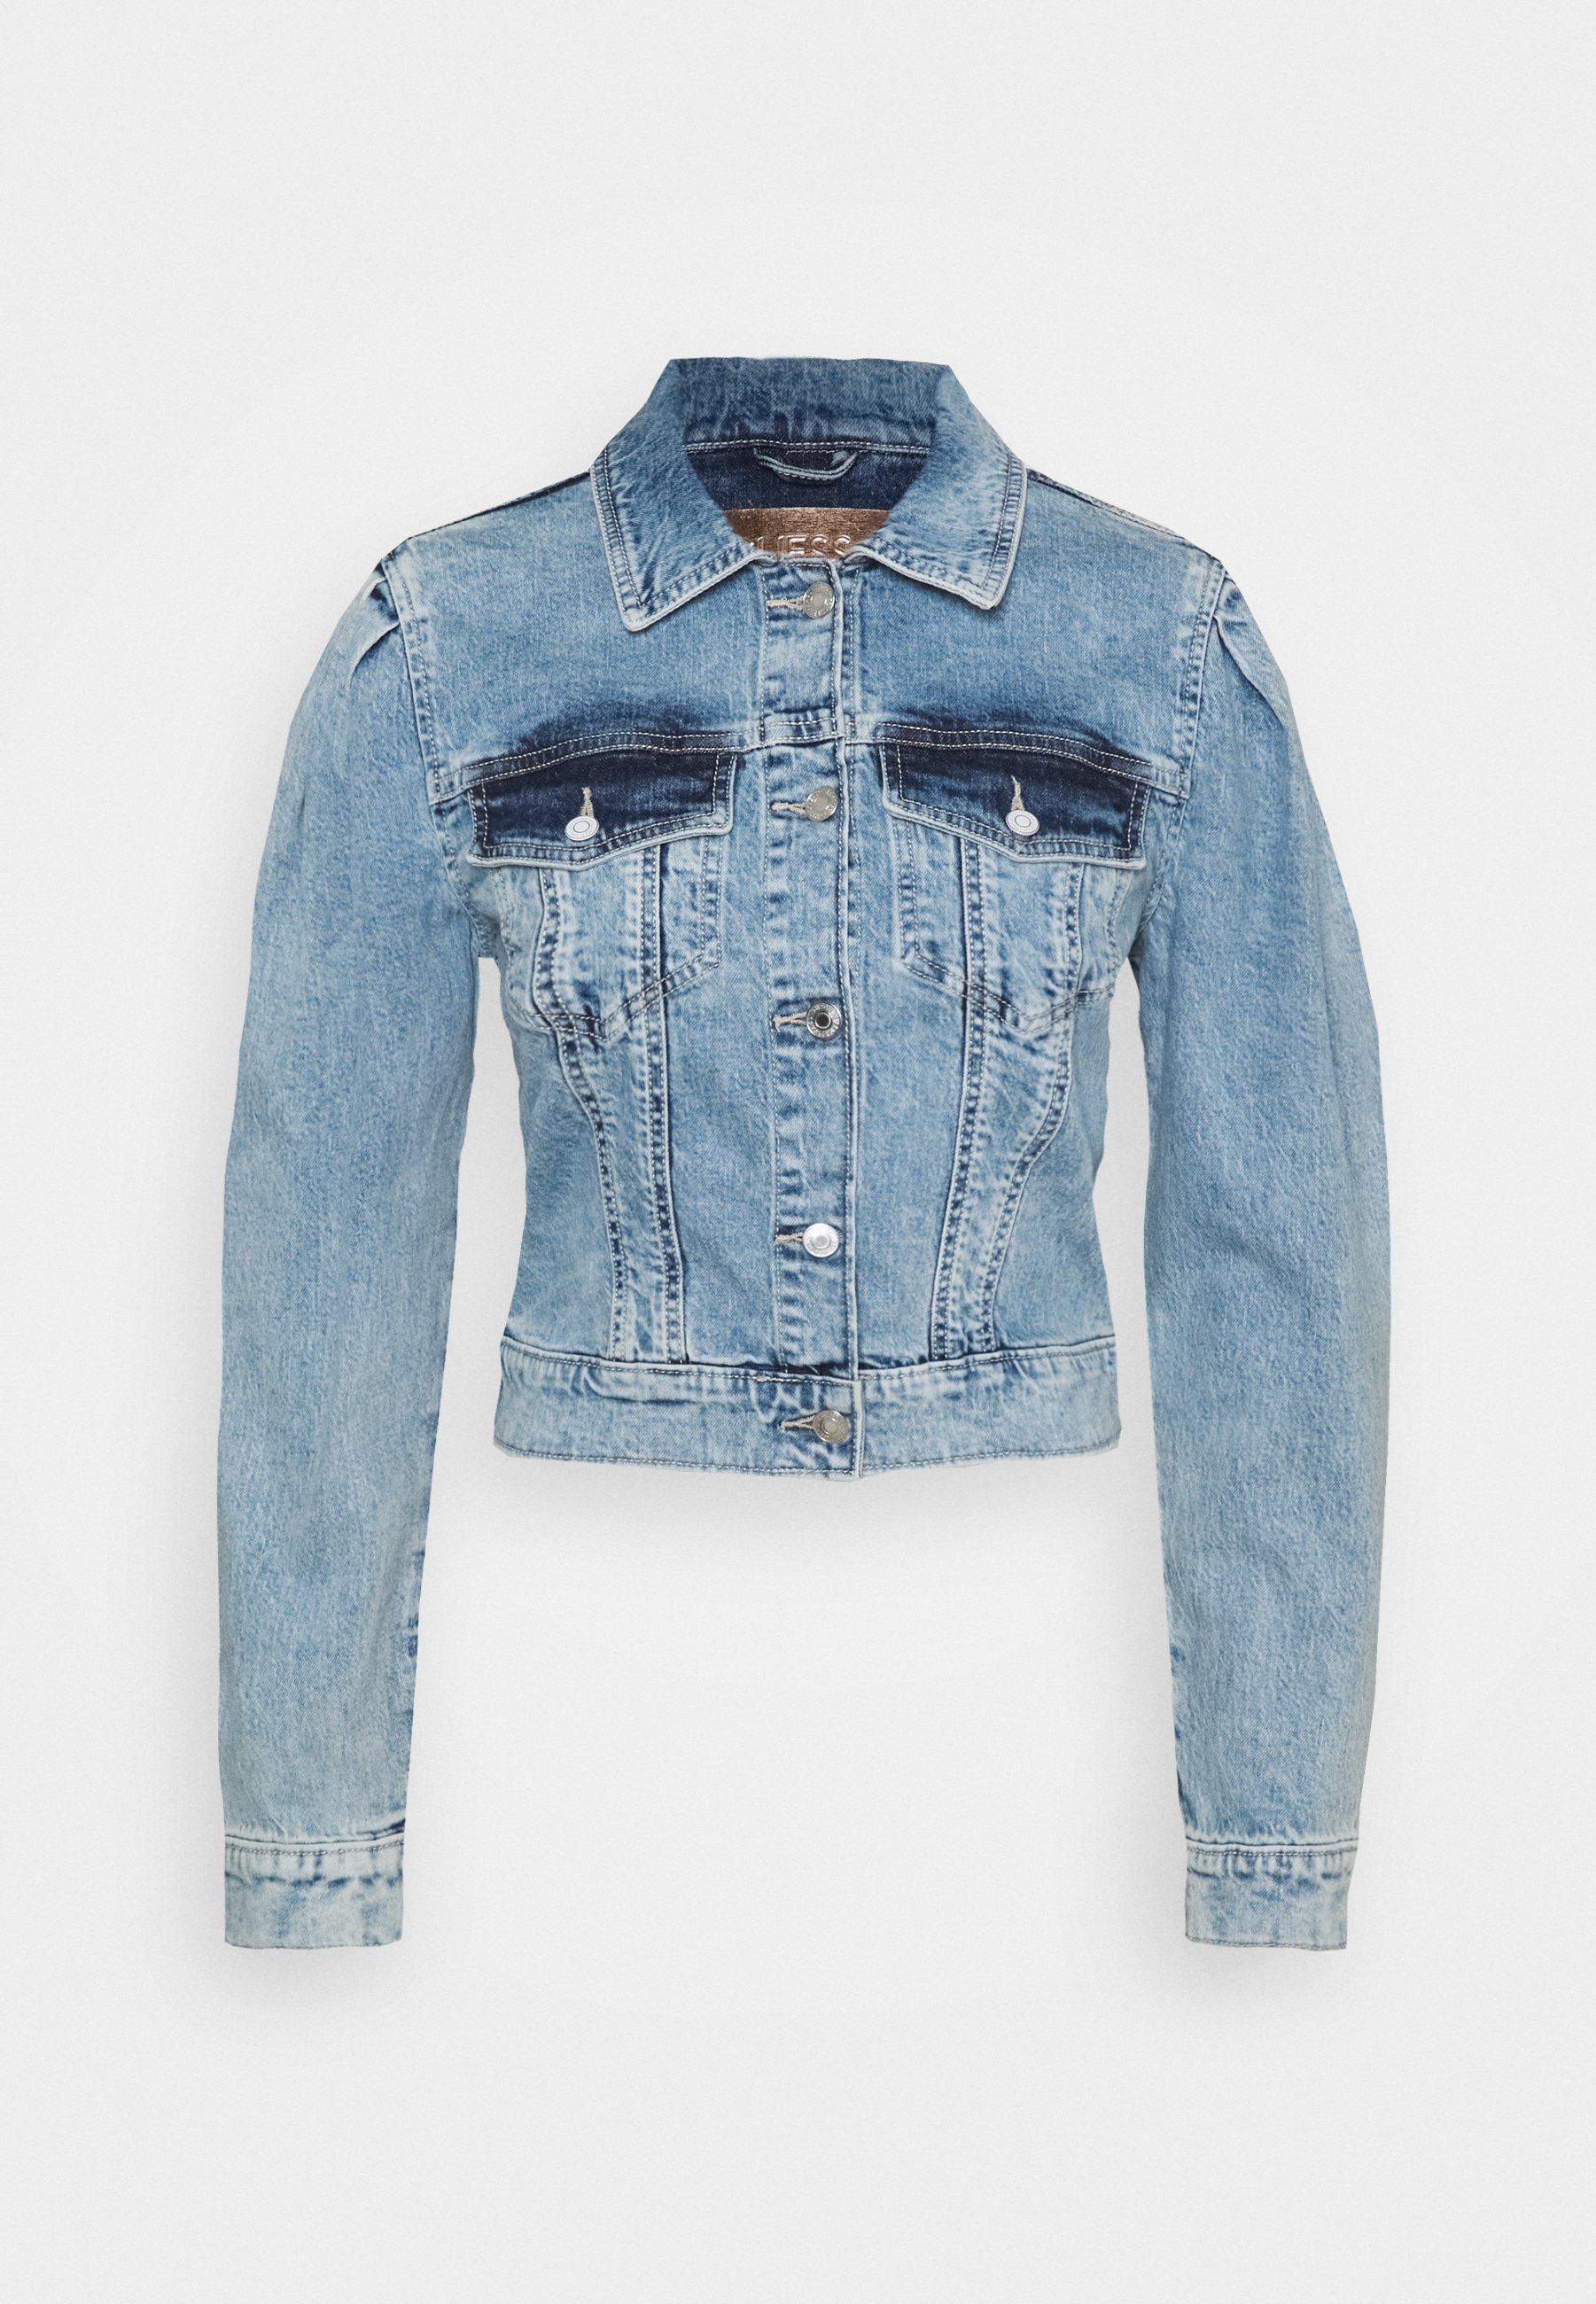 Guess 80S TEDDY JACKET Jeansjakke shallalyseblå denim